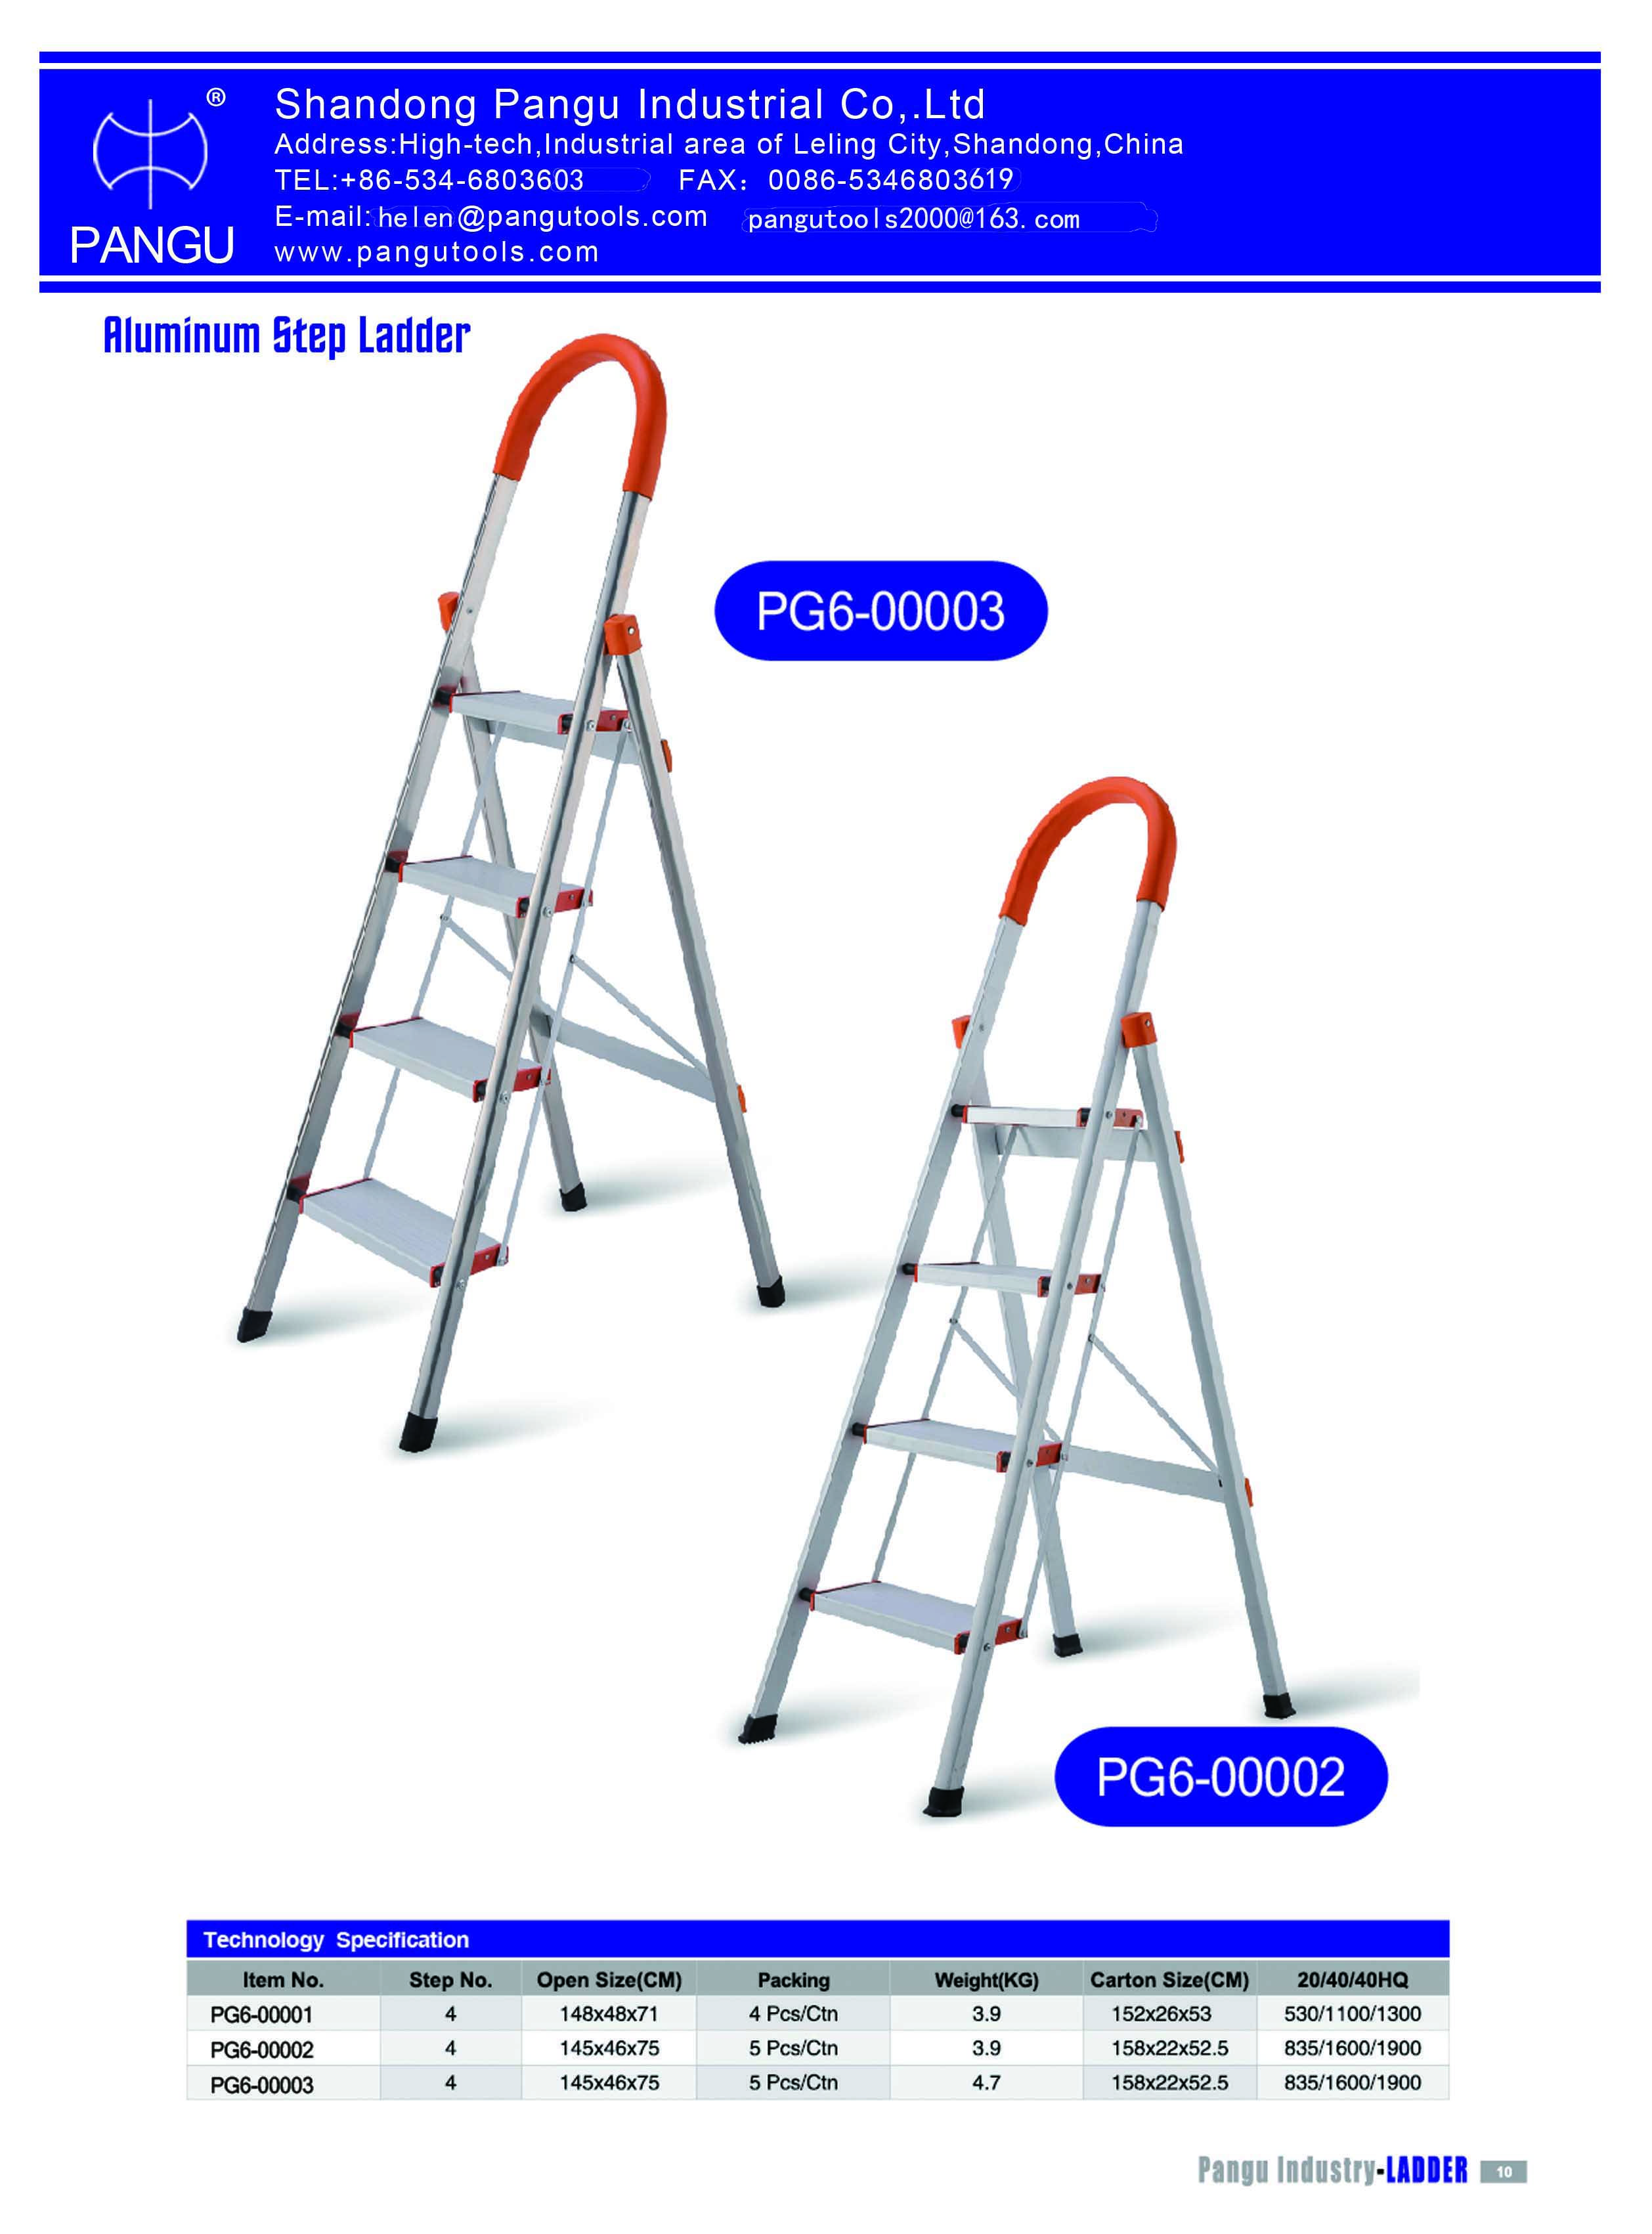 Aluminum step ladder, housework ladder, 5 step